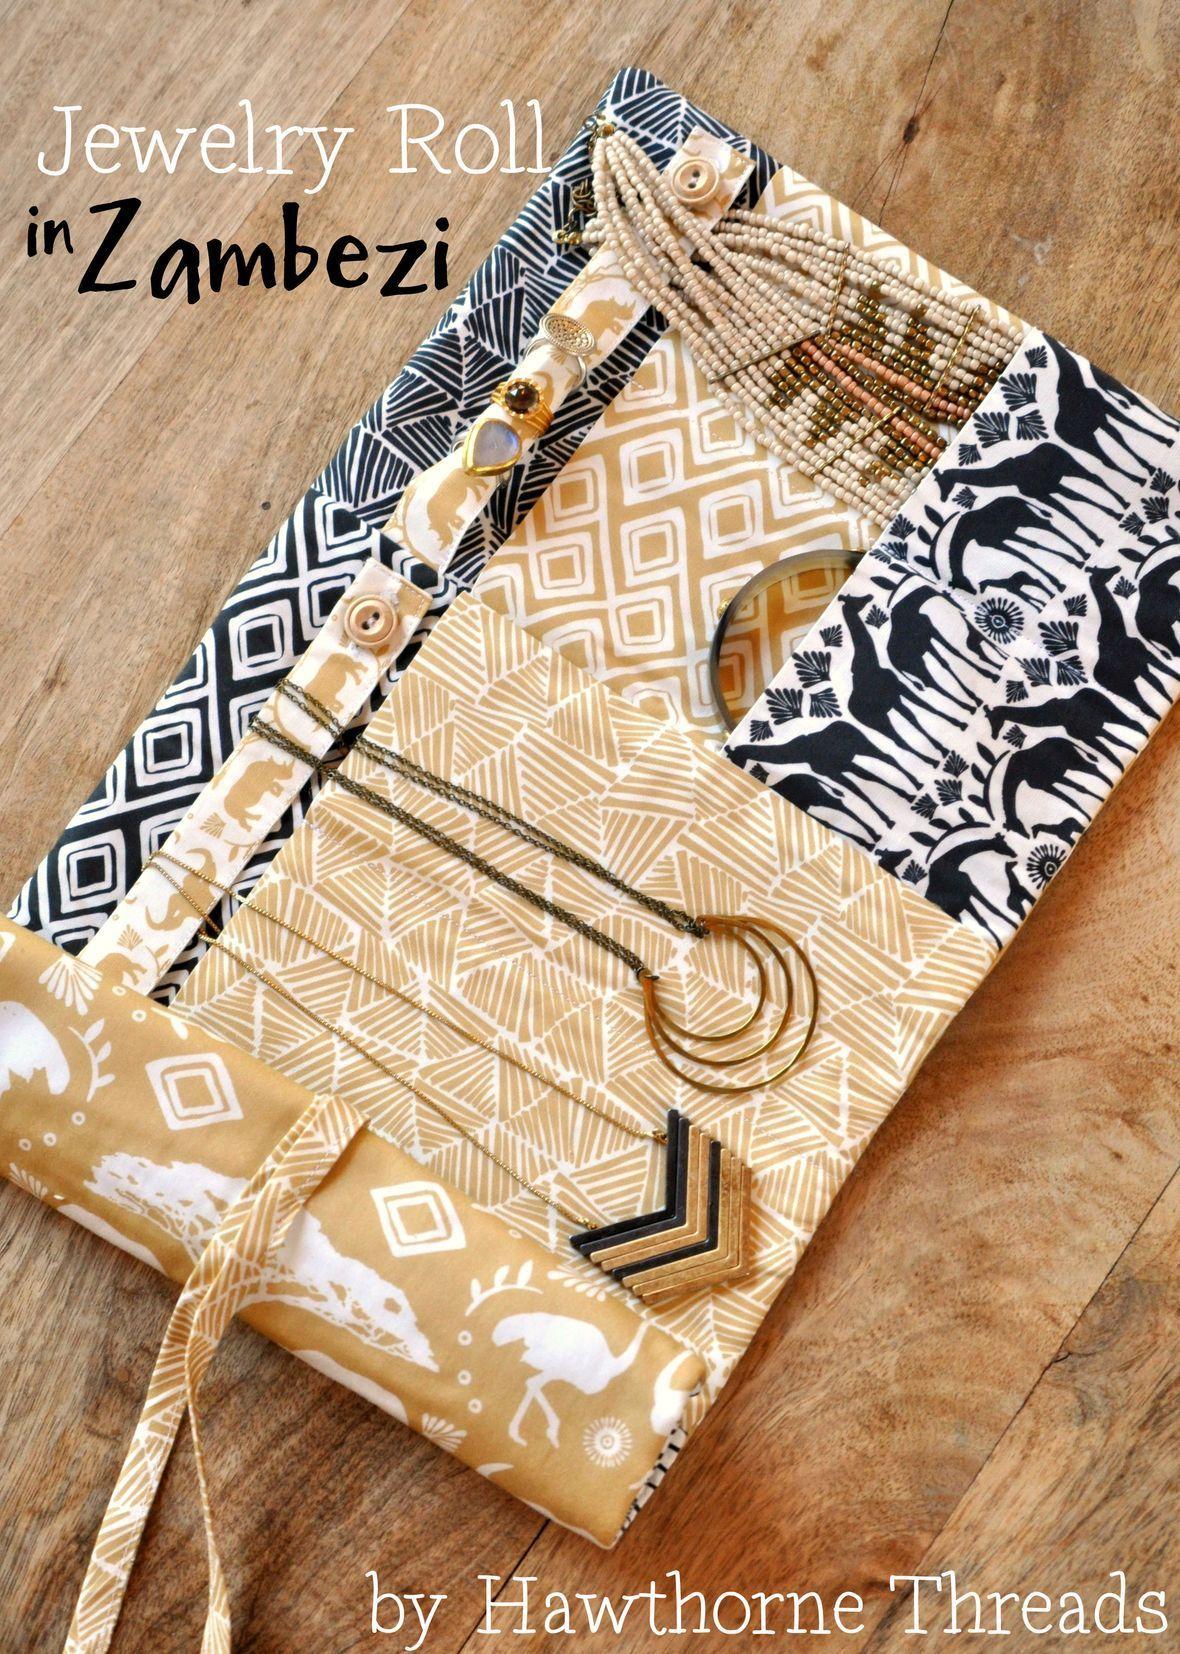 Zambezi Fabric Jewely Roll Hawthorne Threads